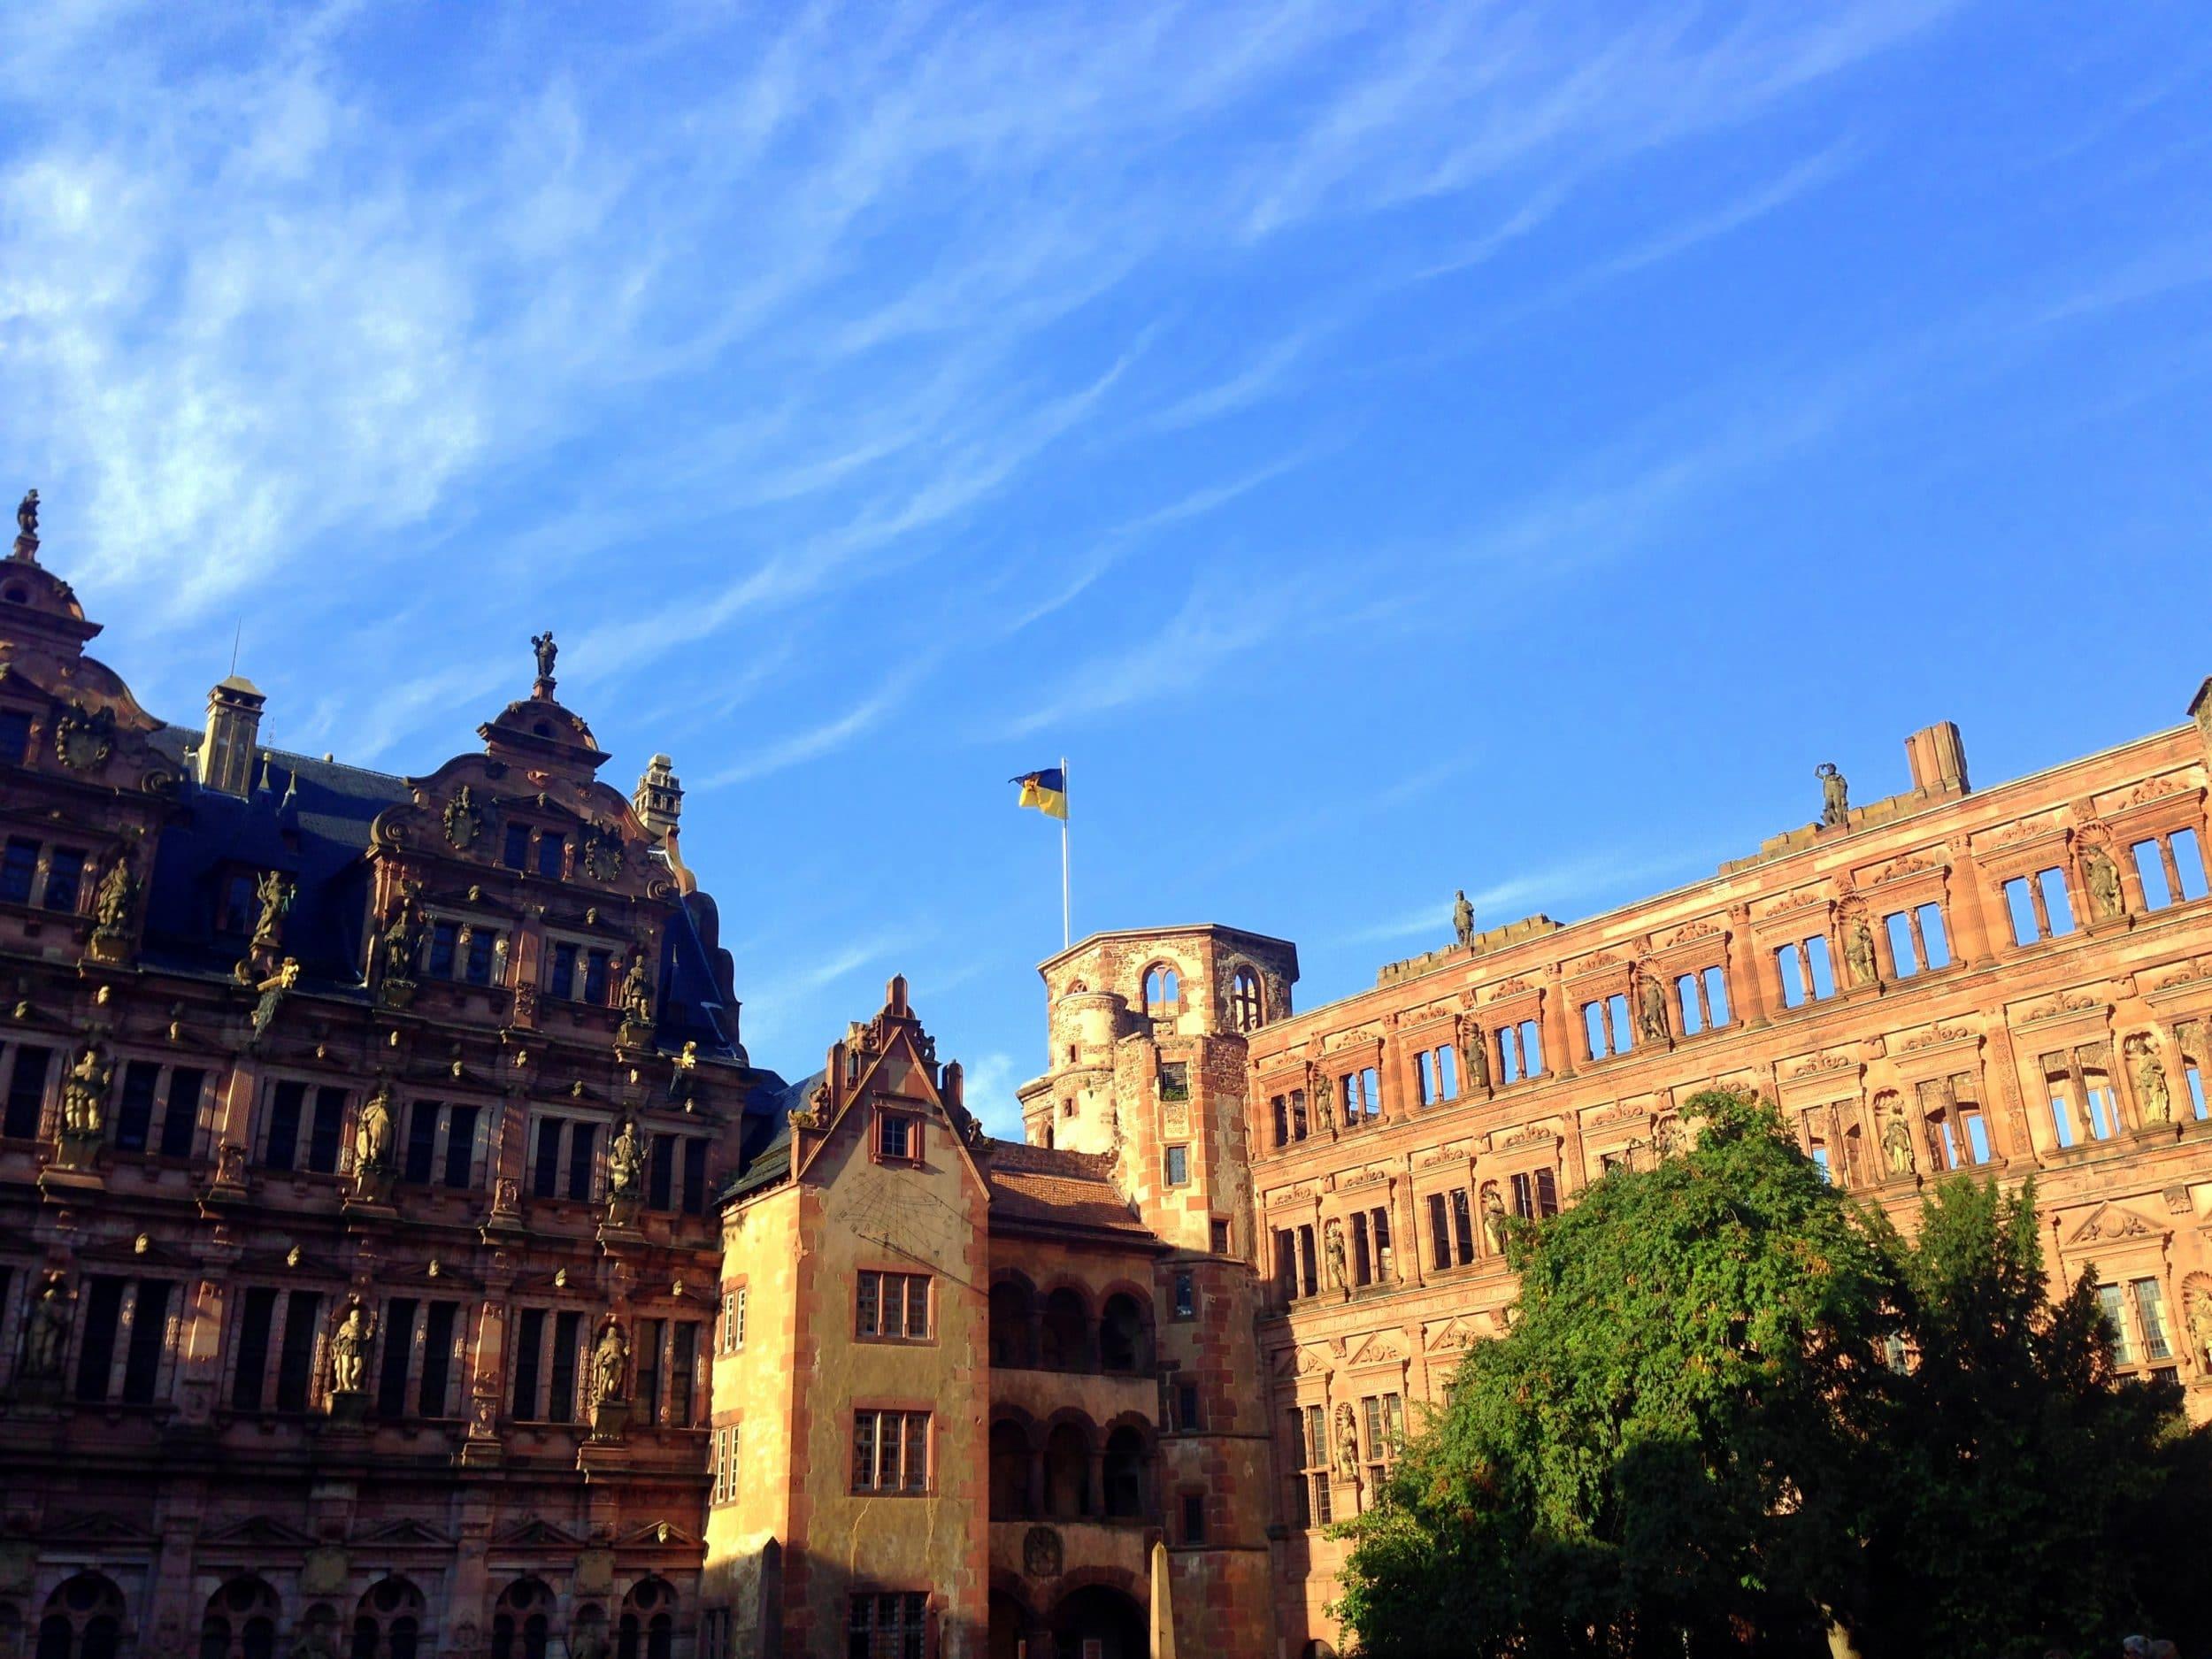 Schloss Heidelberg via Wayfaring With Wagner